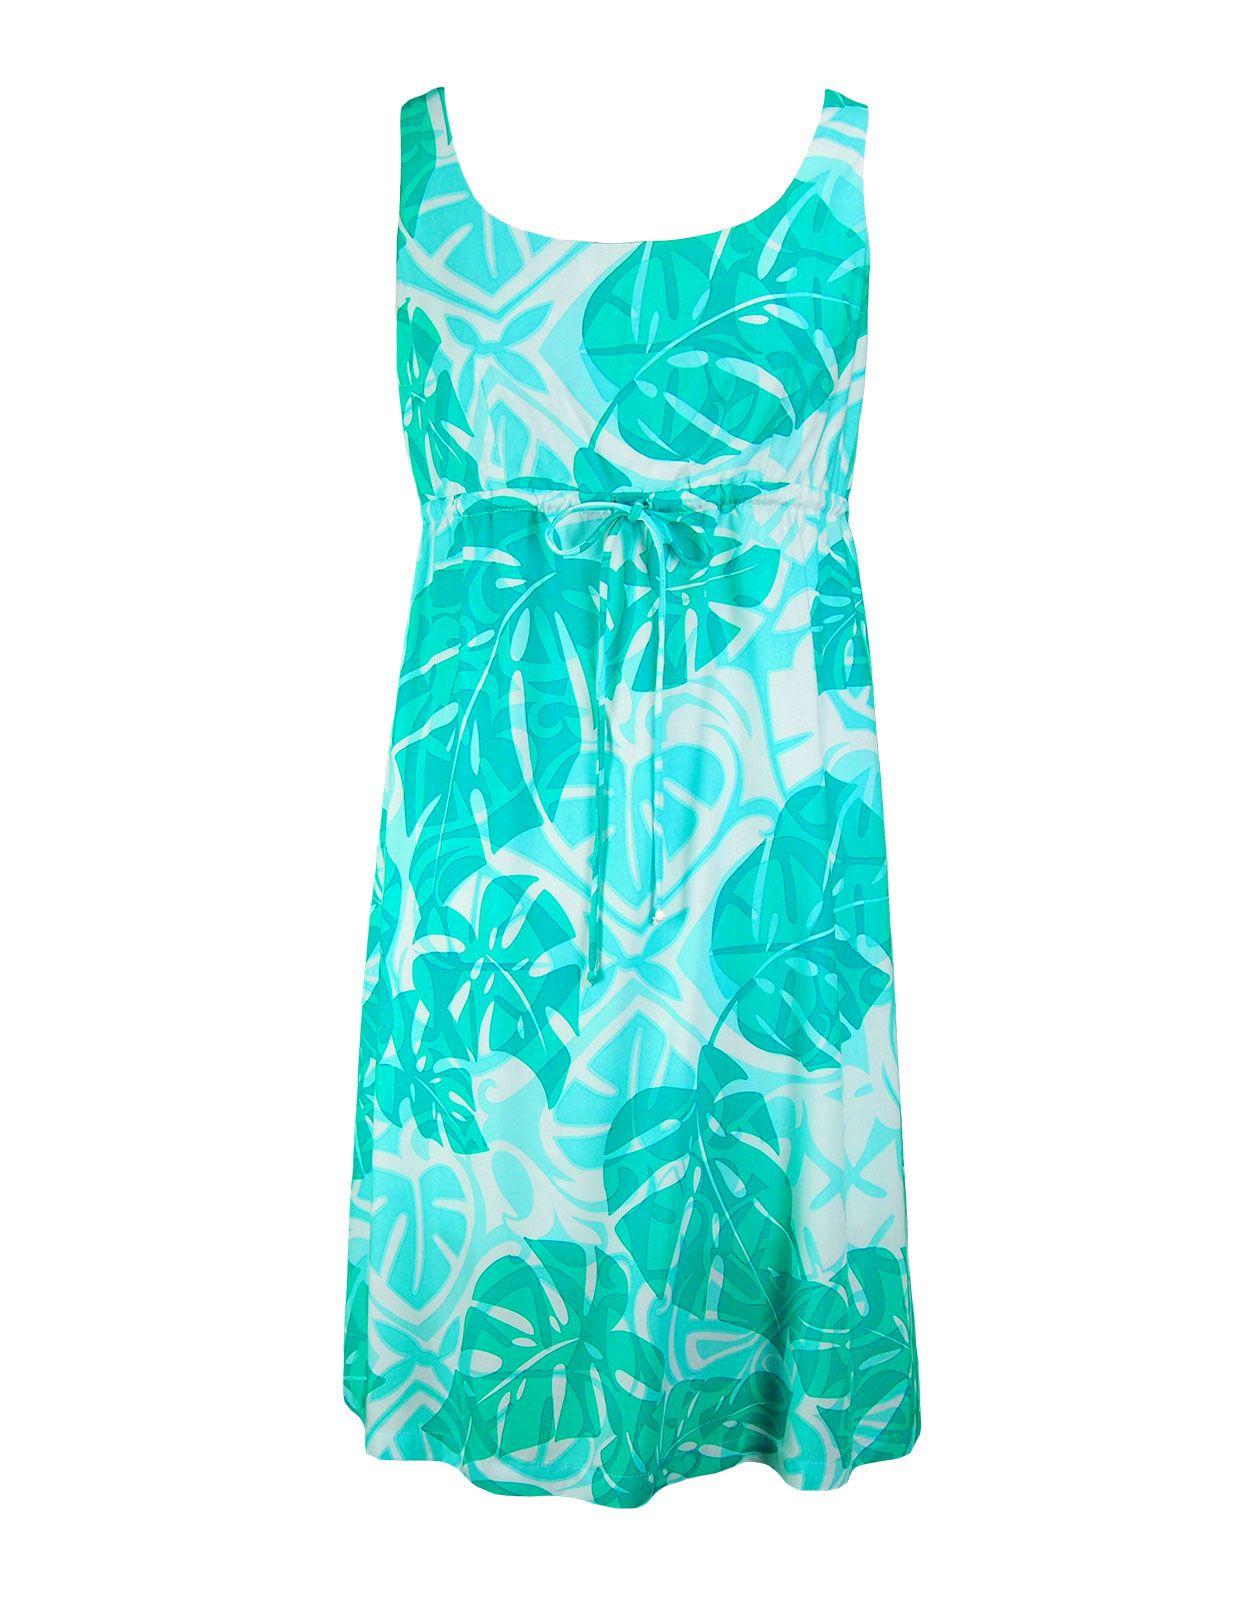 362438f08e Tropical Dream Aloha Dresses with Adjustable Front Tie : Shaka Time Hawaii  Clothing Store #hawaiian #dresses